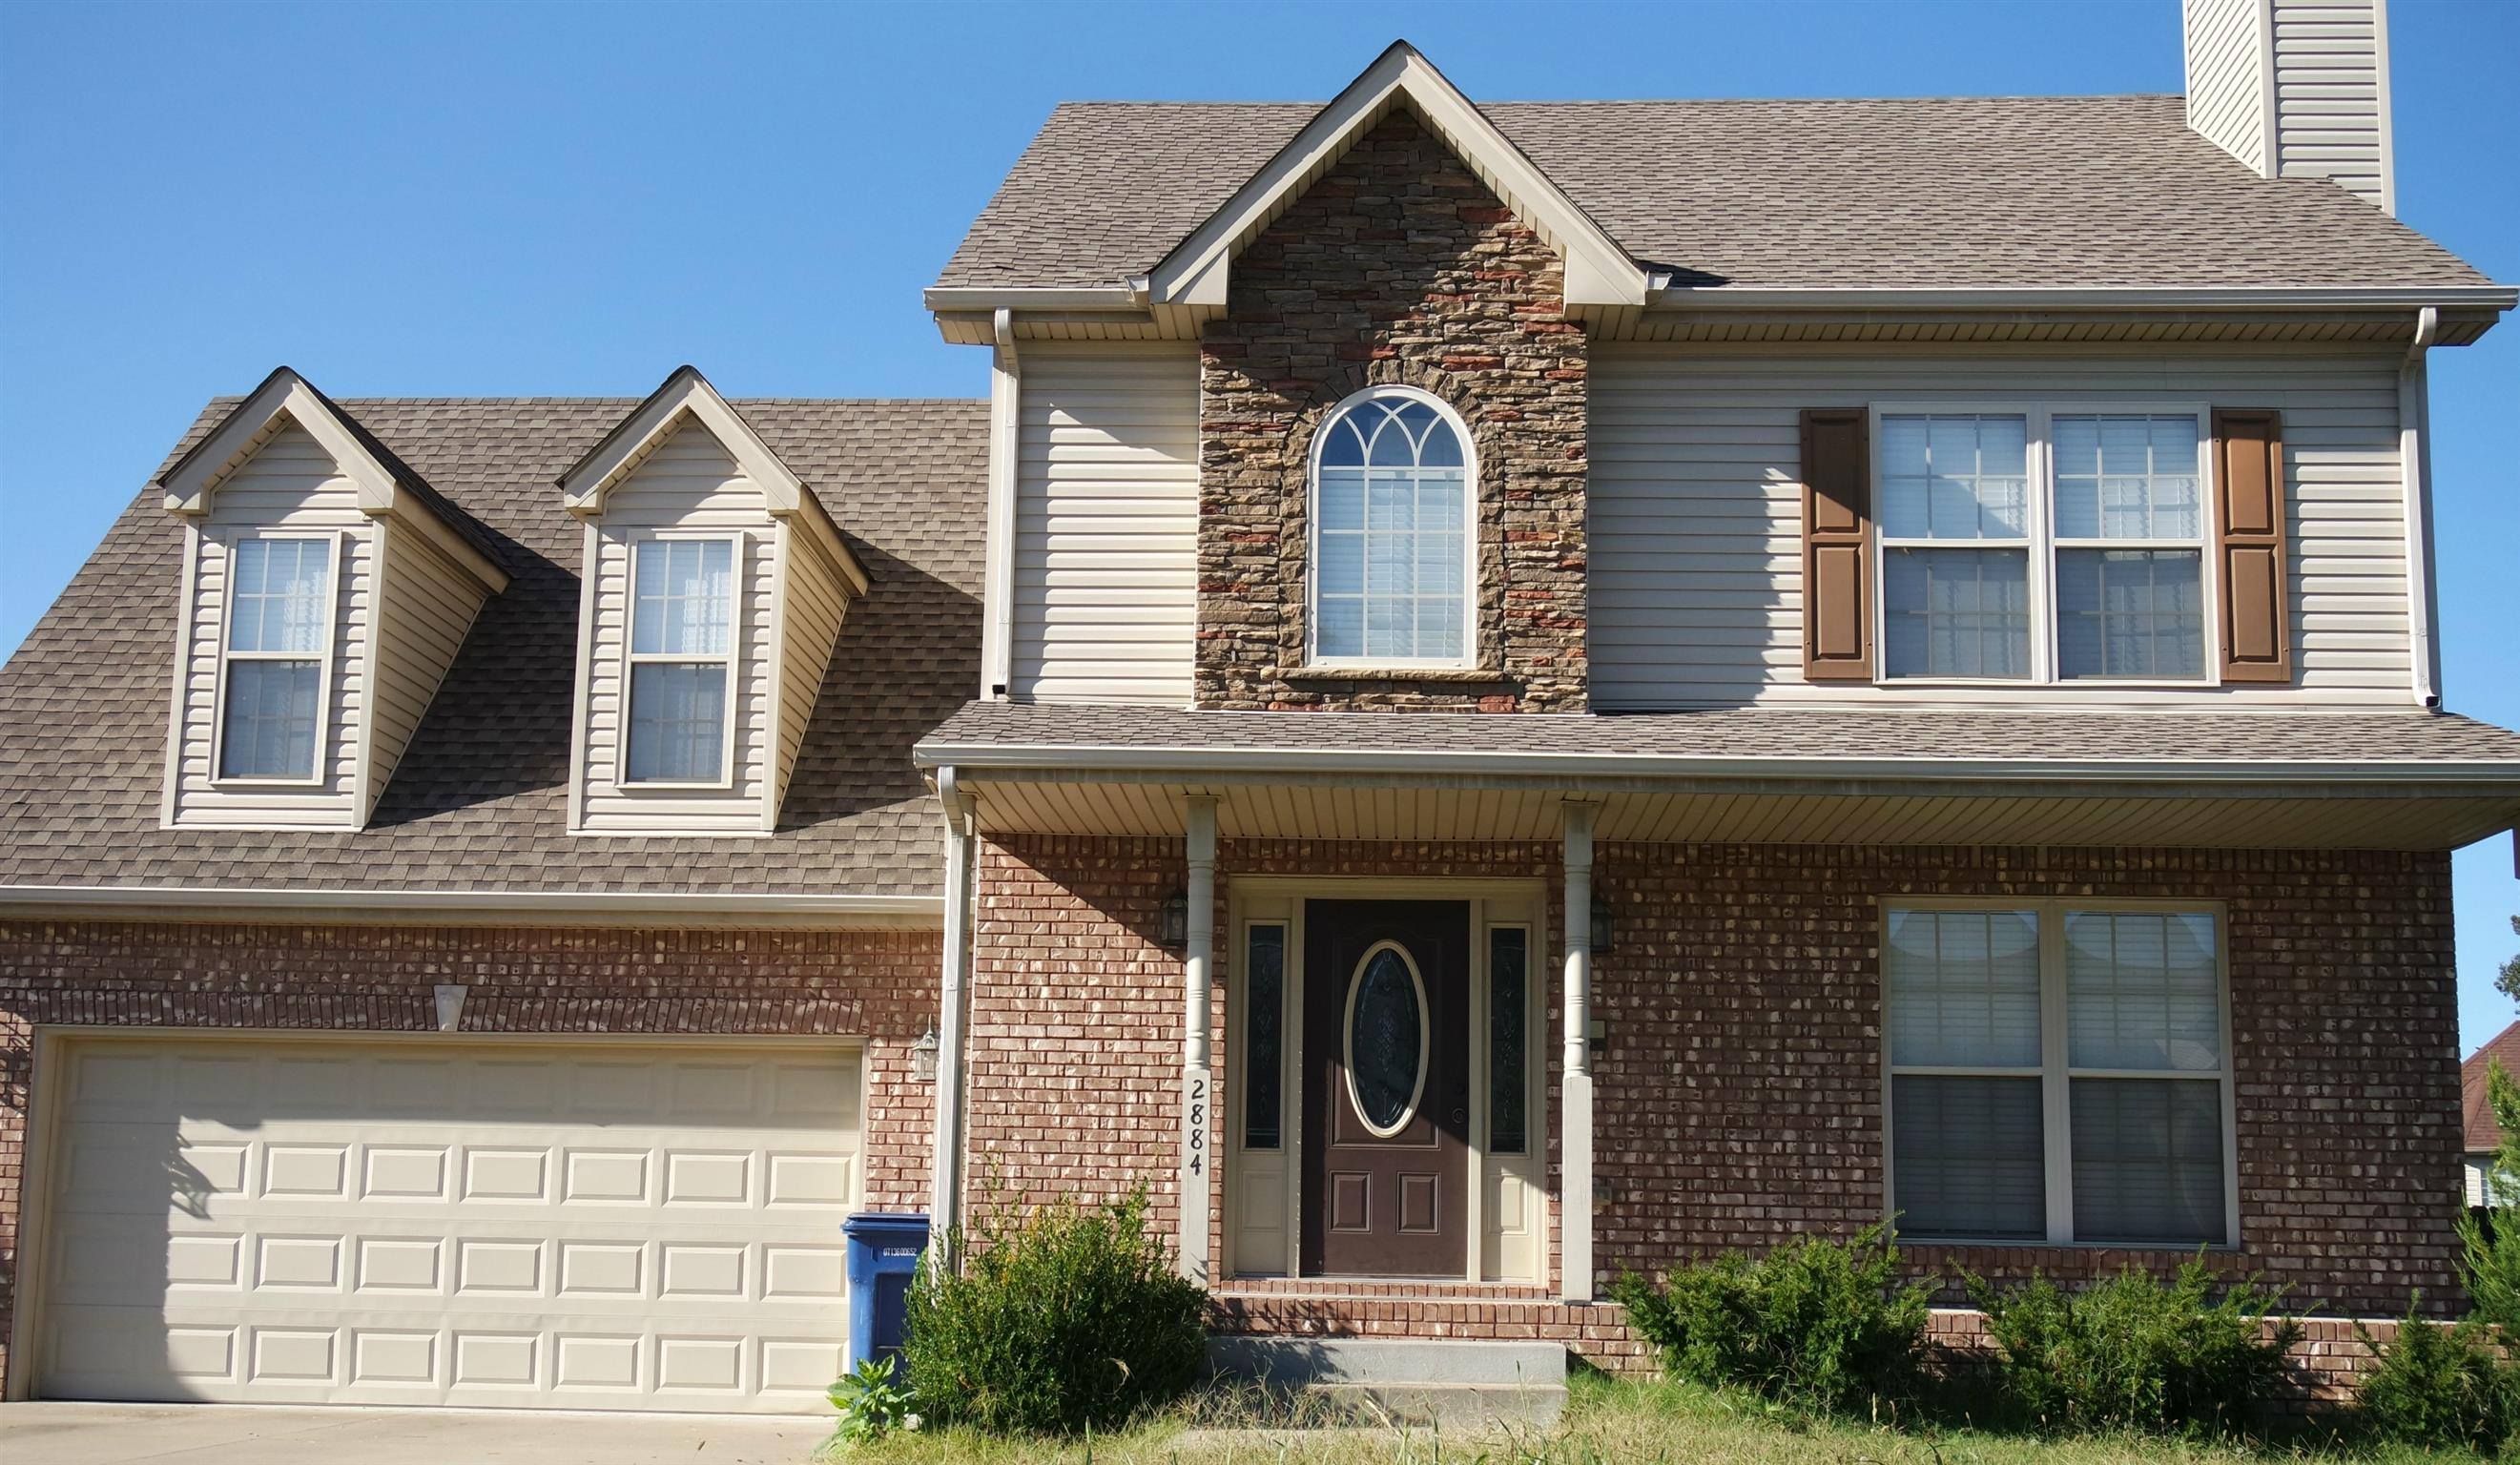 2884 Brewster Dr, Clarksville, TN 37042 - Clarksville, TN real estate listing